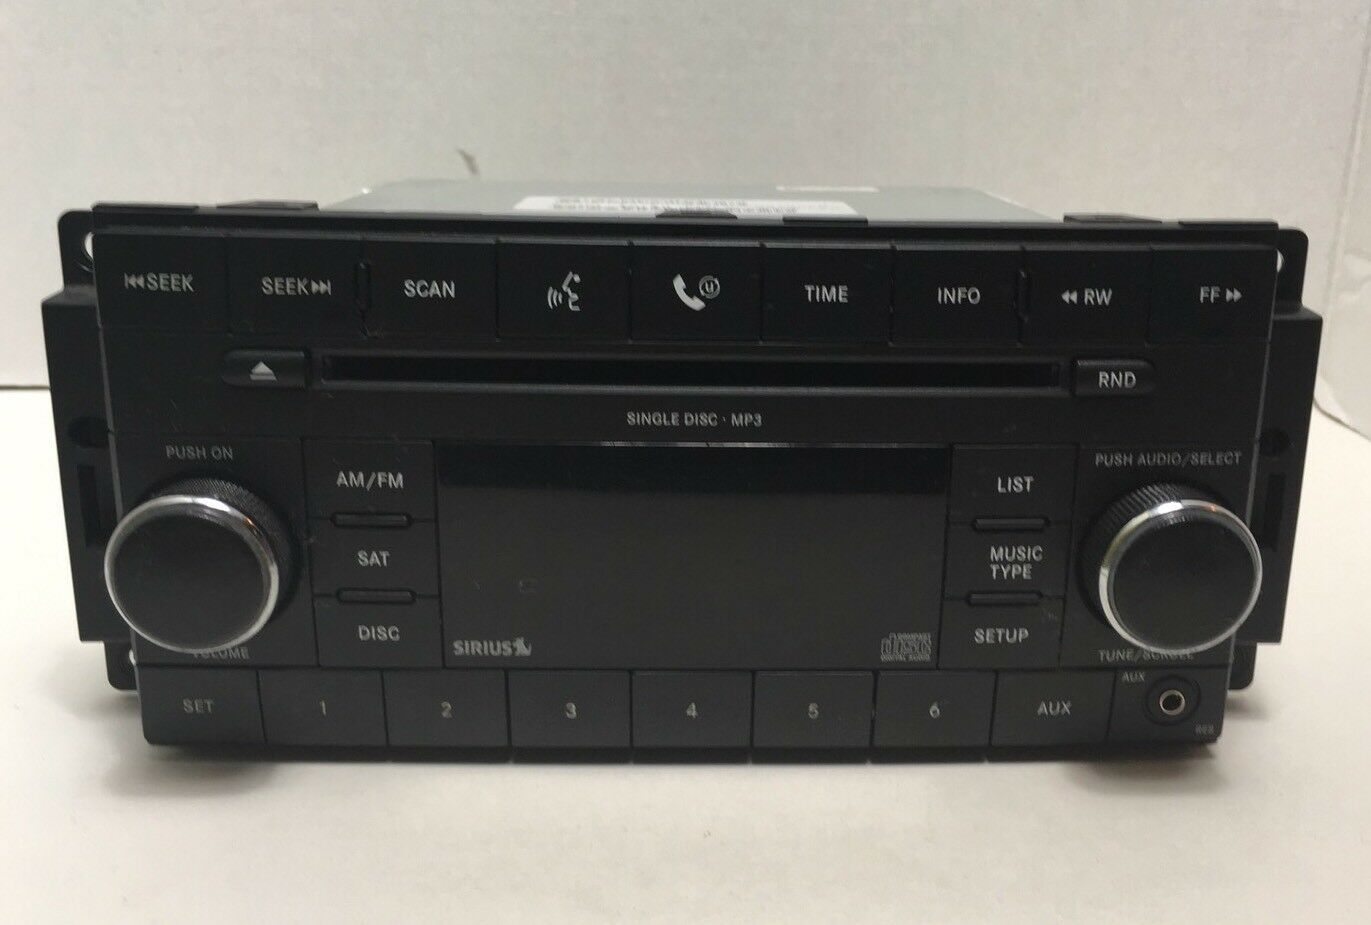 Chrysler Jeep OEM Satellite Single Disc MP3 CD Radio Tuner 08-12 P05064421AF image 2